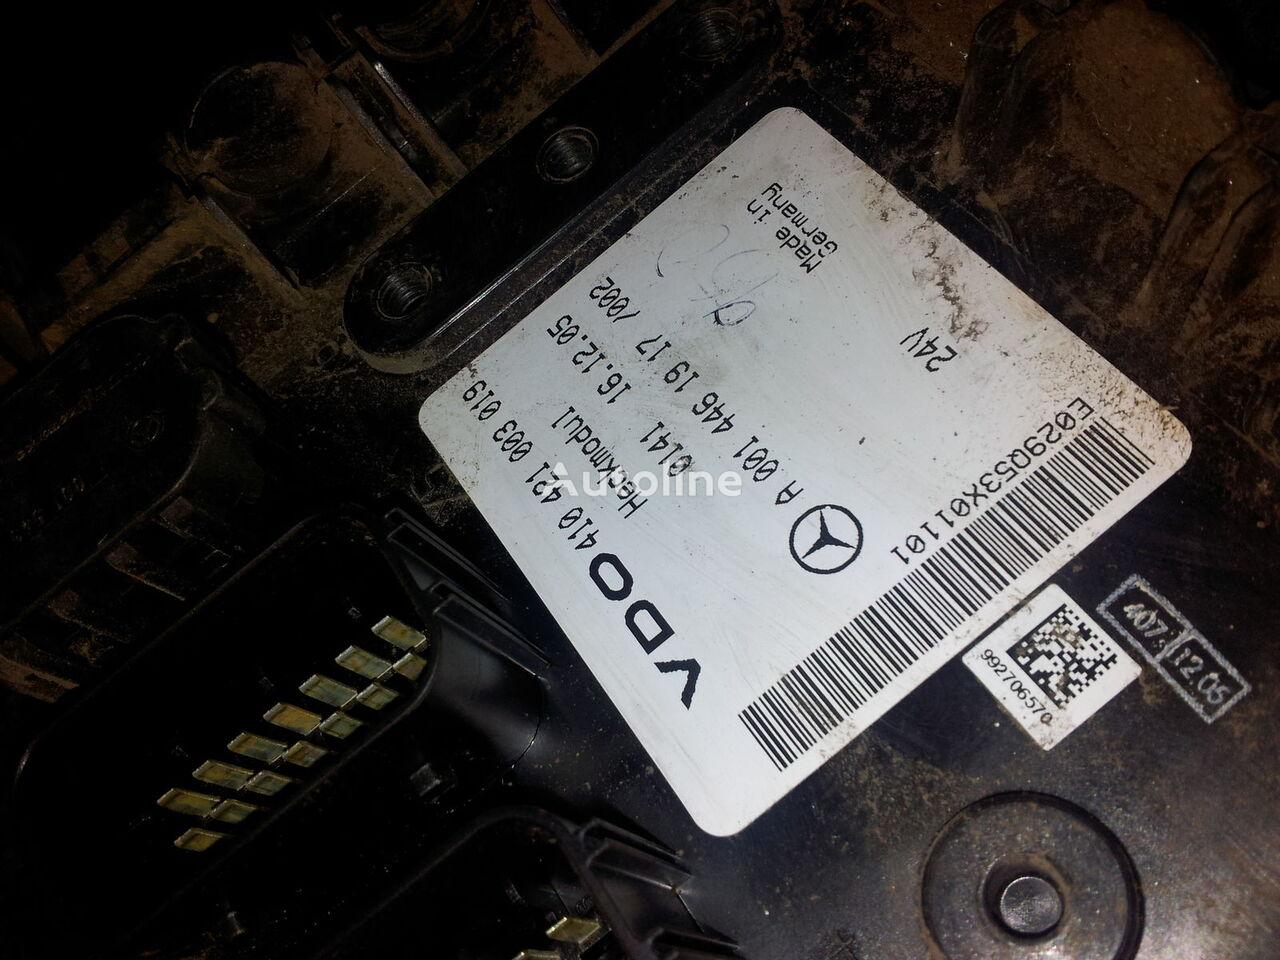 upravljačka jedinica  MB Actros MP2, MP3, Heckmodul, control unit, EDC, ECU, rear module electronics, 0014461917, 0014462817, 0014462017,0014461917,0014462717,0014461617, 41021003020, 410421003019, 0014462817 za tegljača MERCEDES-BENZ Actros MP2; MP3